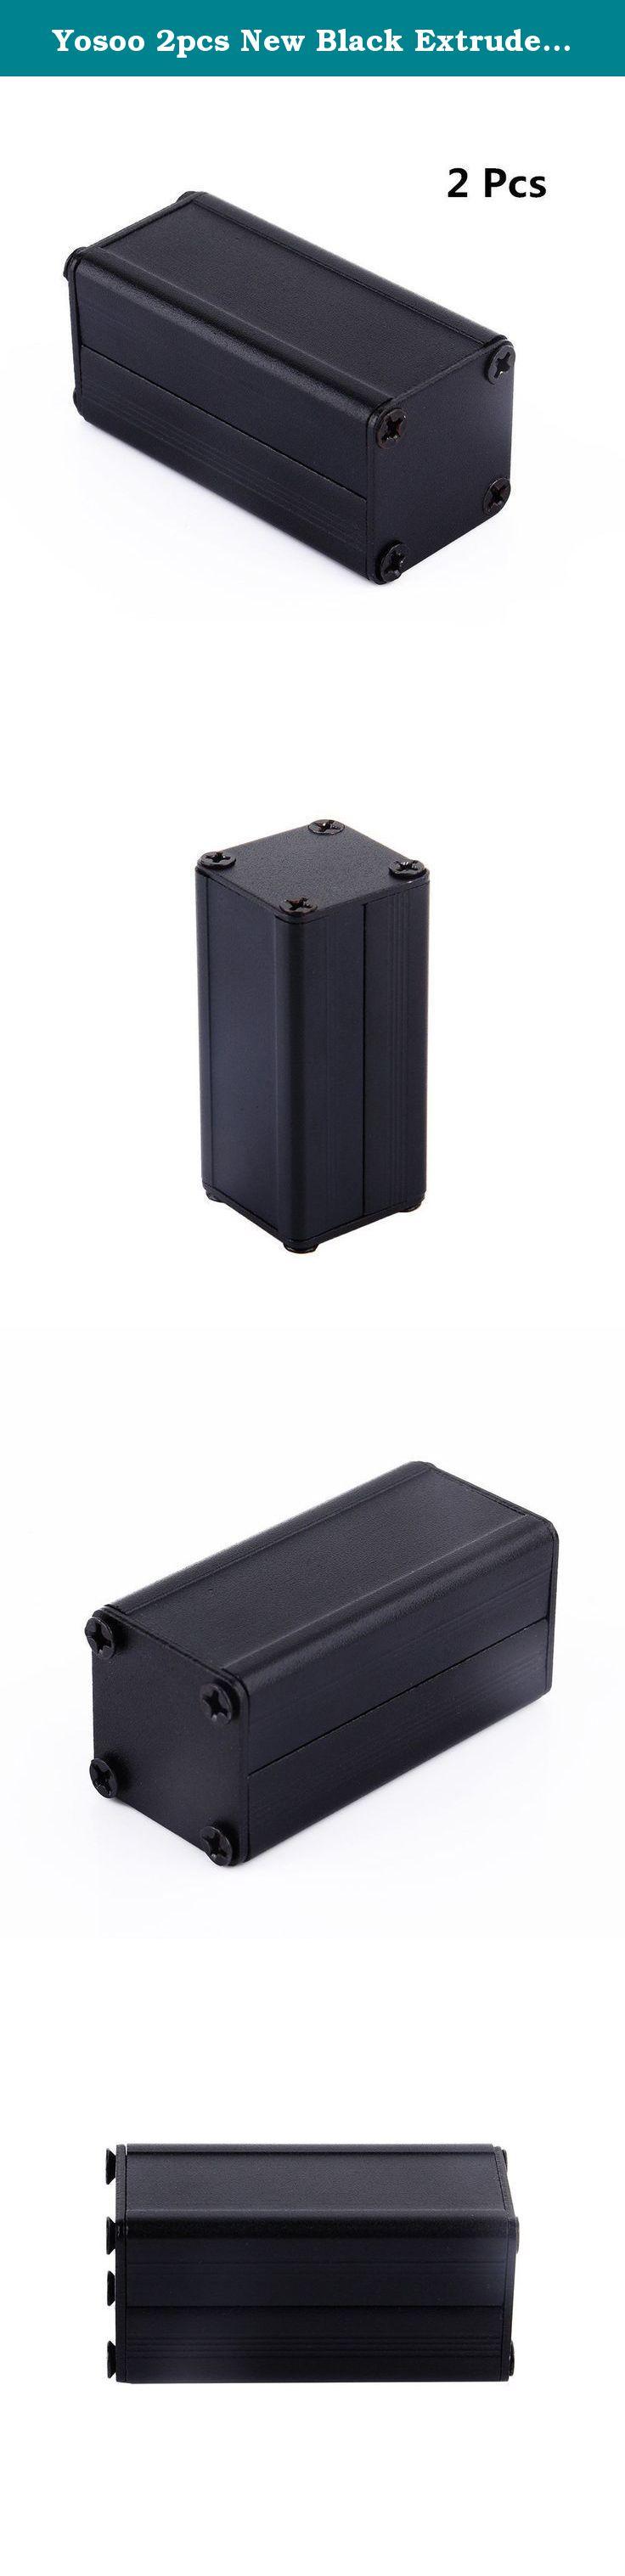 Yosoo 2pcs New Black Extruded Aluminum Electronic … Car